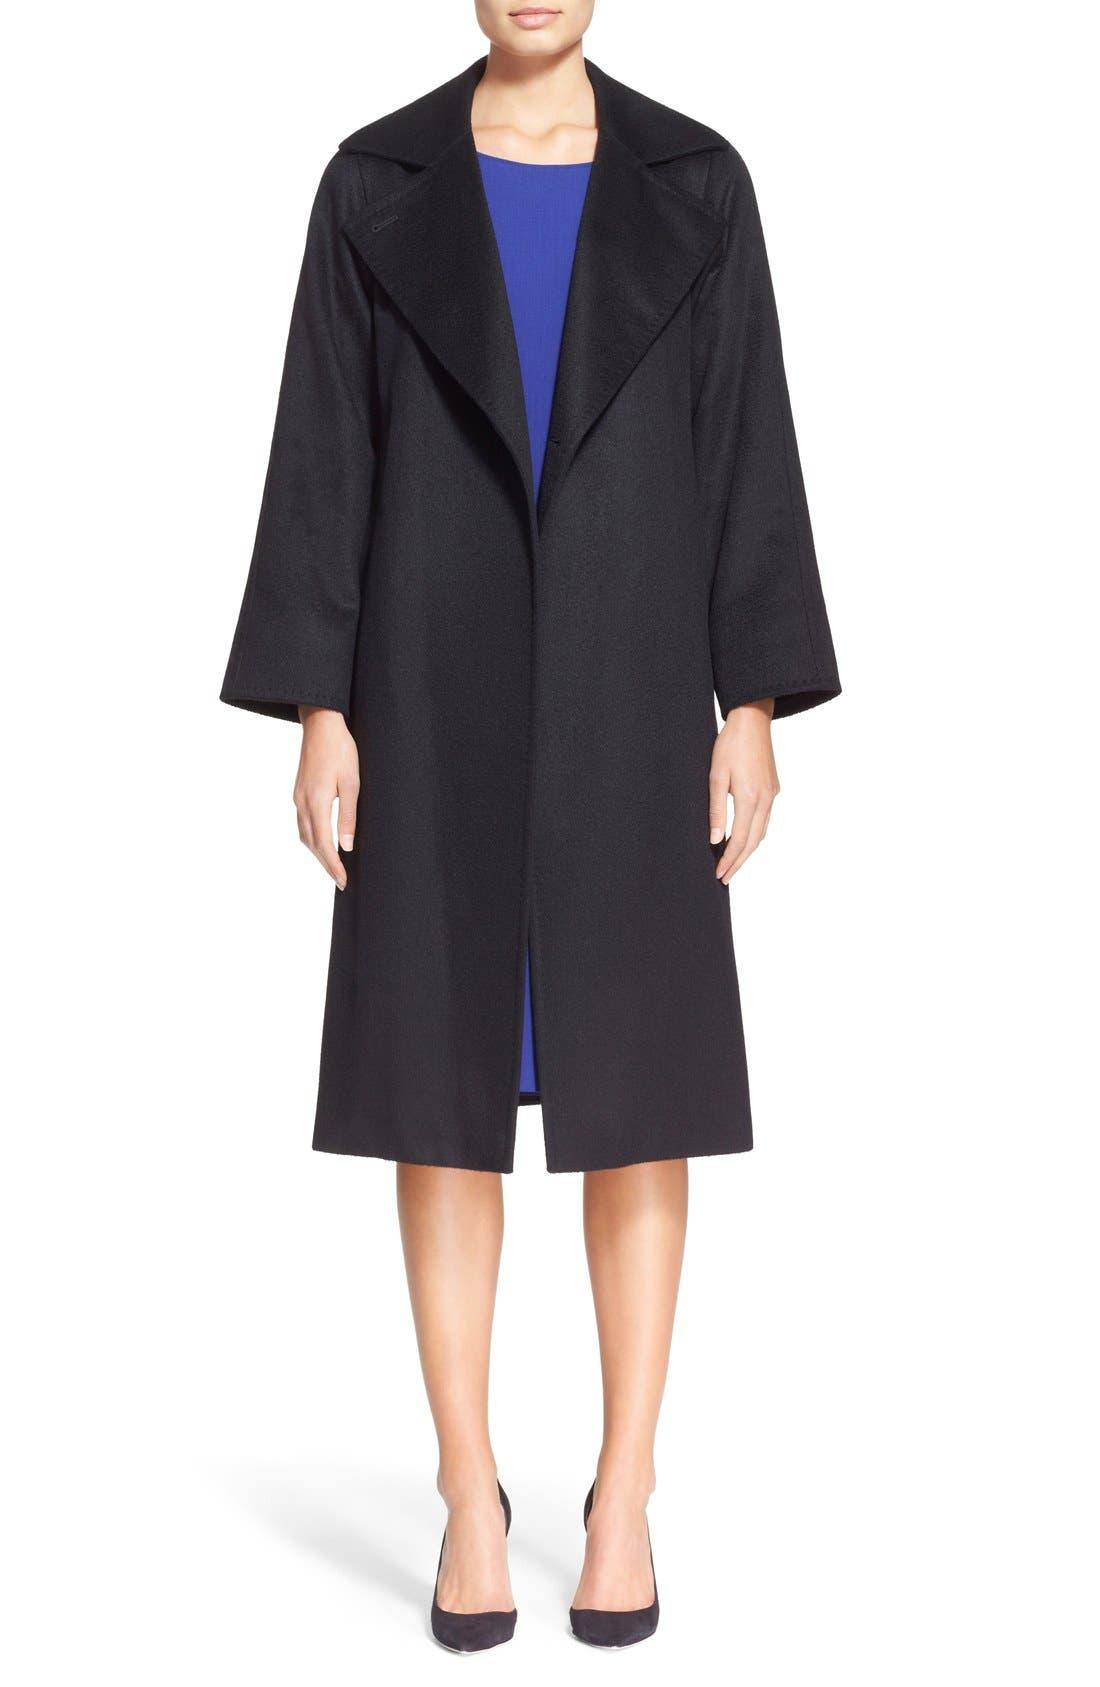 MAX MARA 'Manuela' Camel Hair Coat, Main, color, BLACK